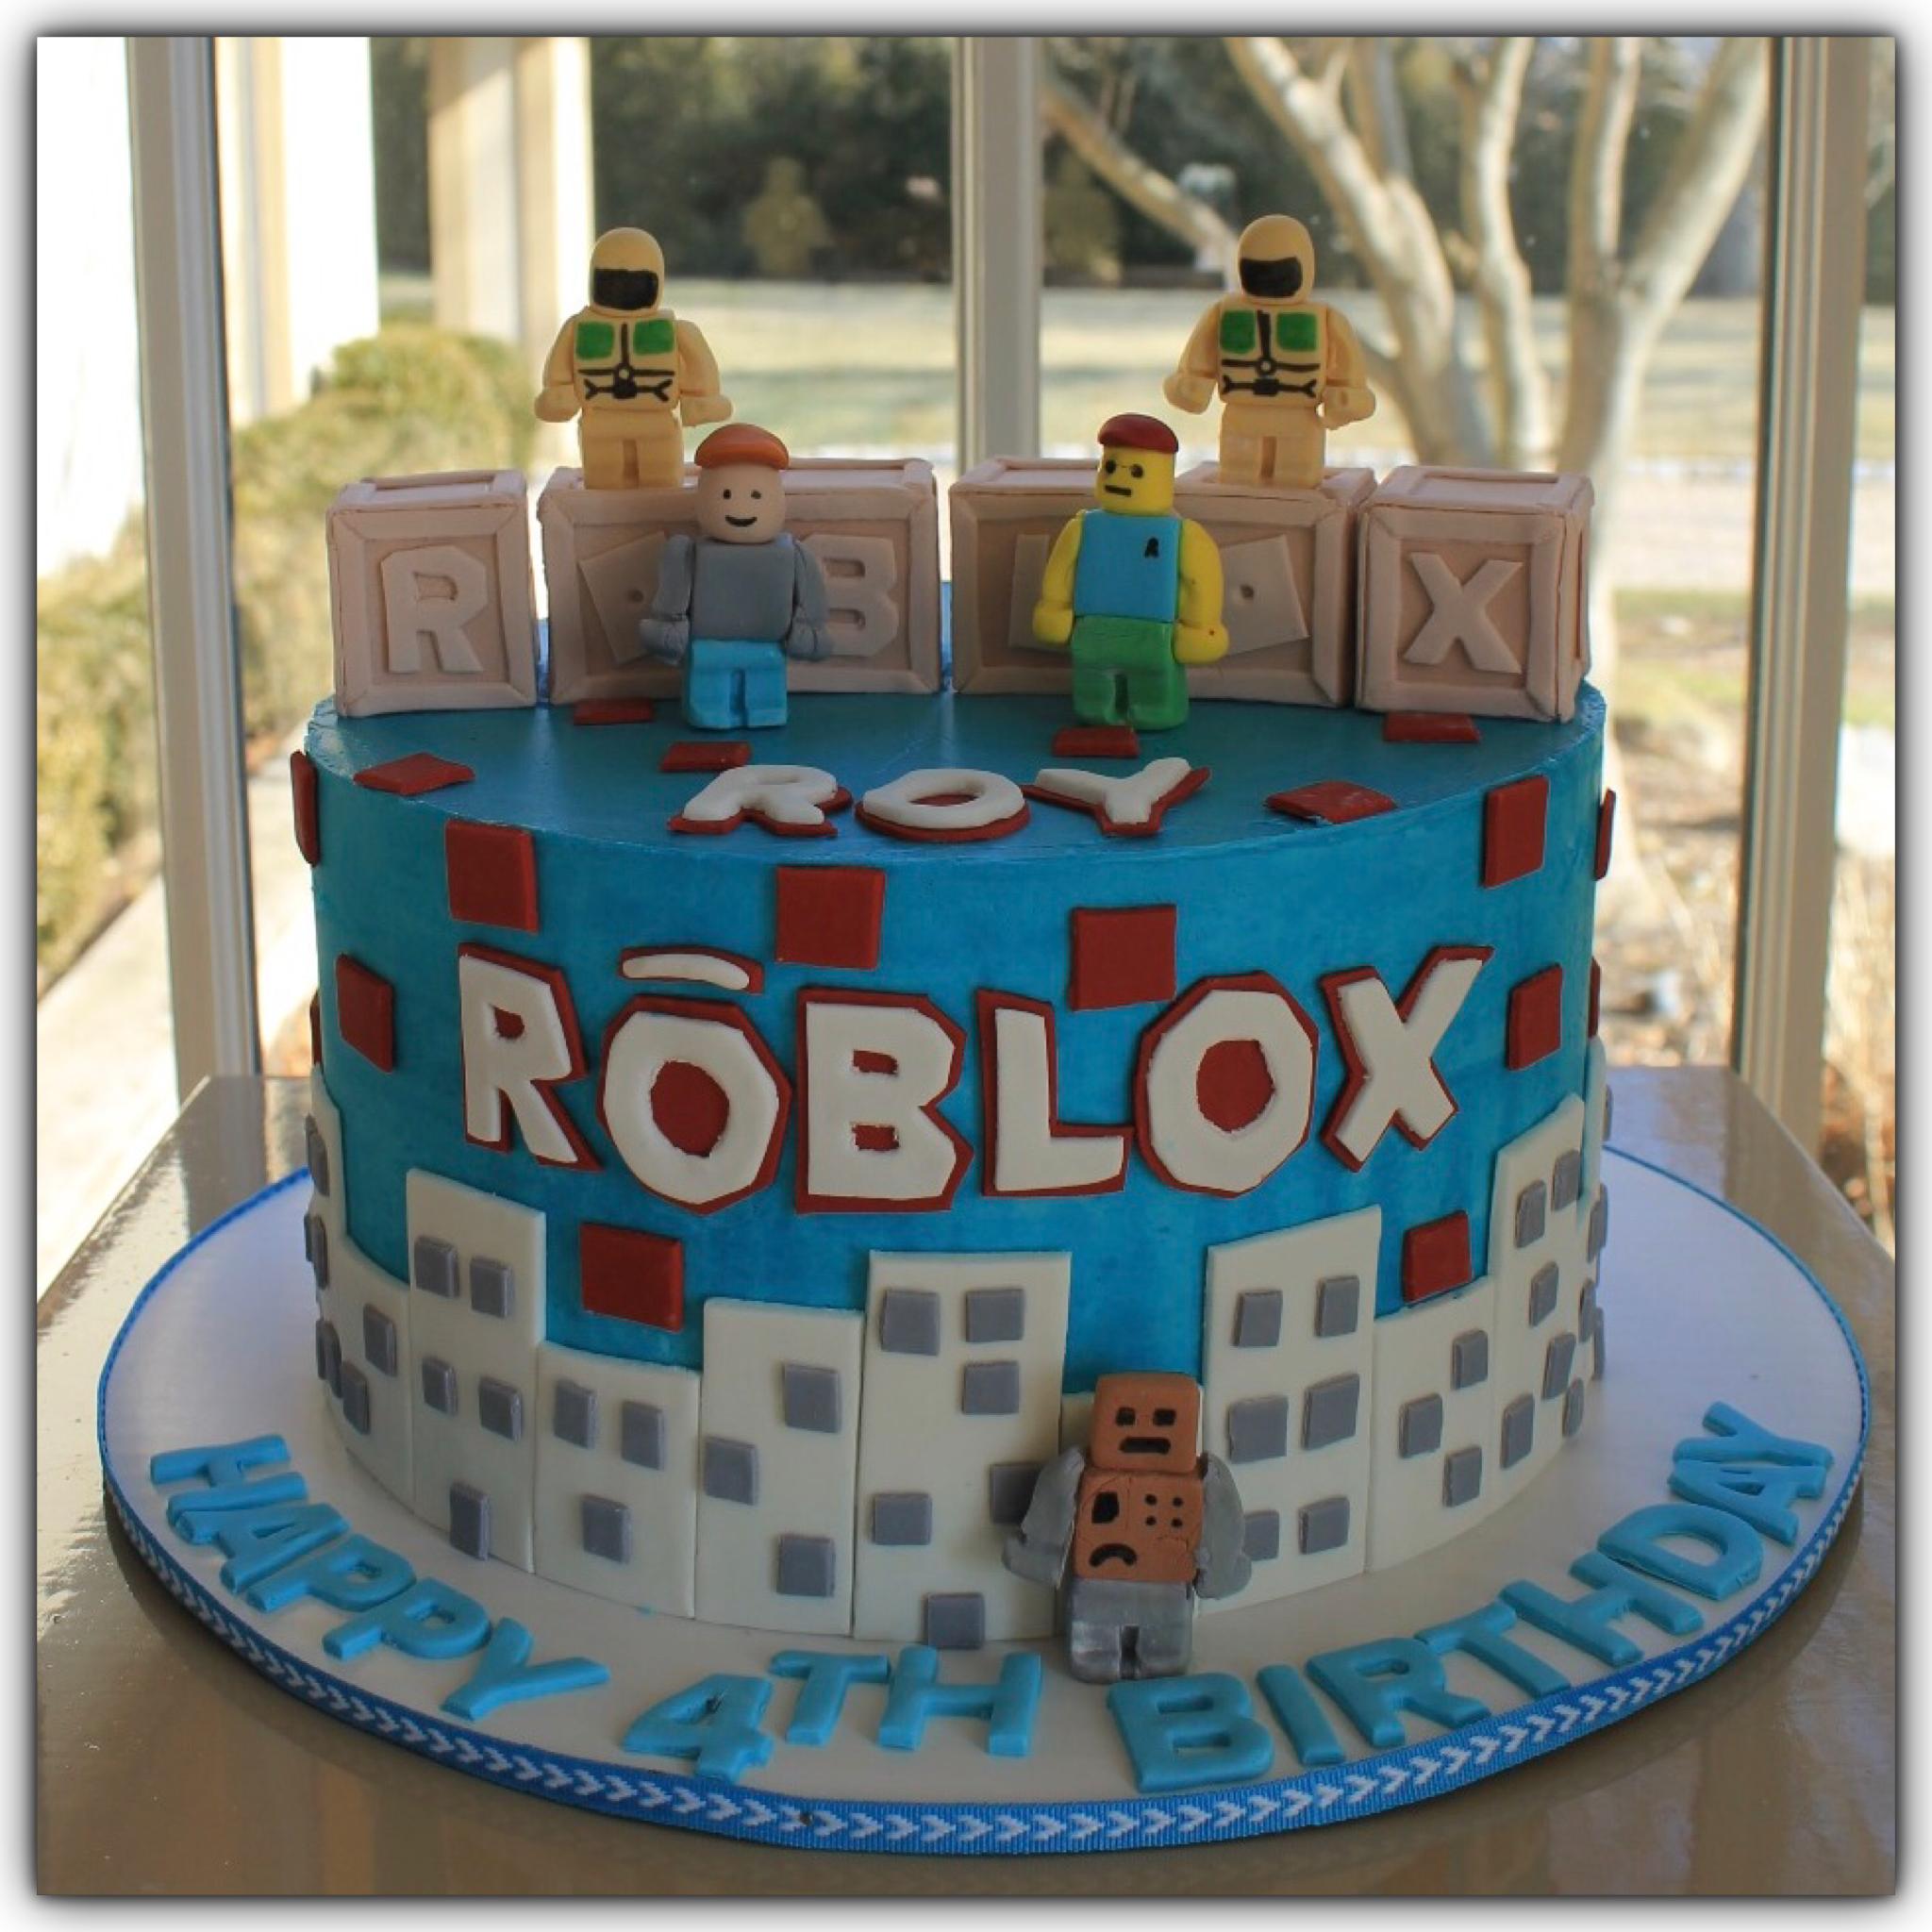 Roblox Cake Fiesta Cumpleanos Tortas De Cumpleanos Pastel Cumple